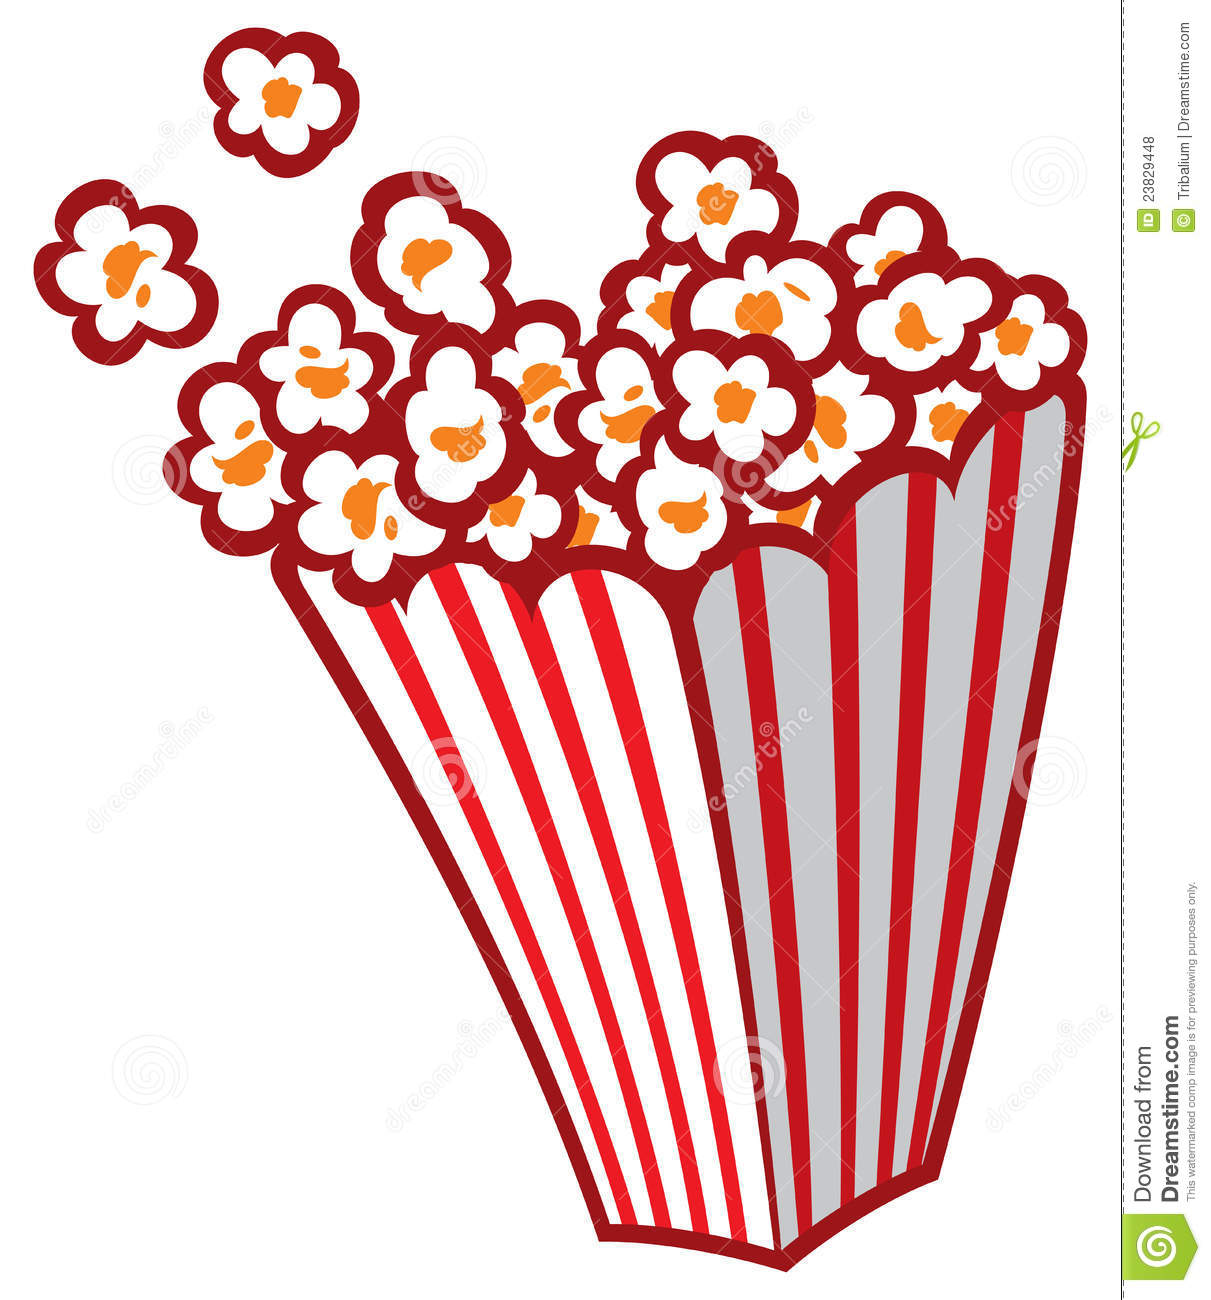 Carneval clipart popcorn bucket Art Free popcorn%20bag%20clipart Circus Popcorn